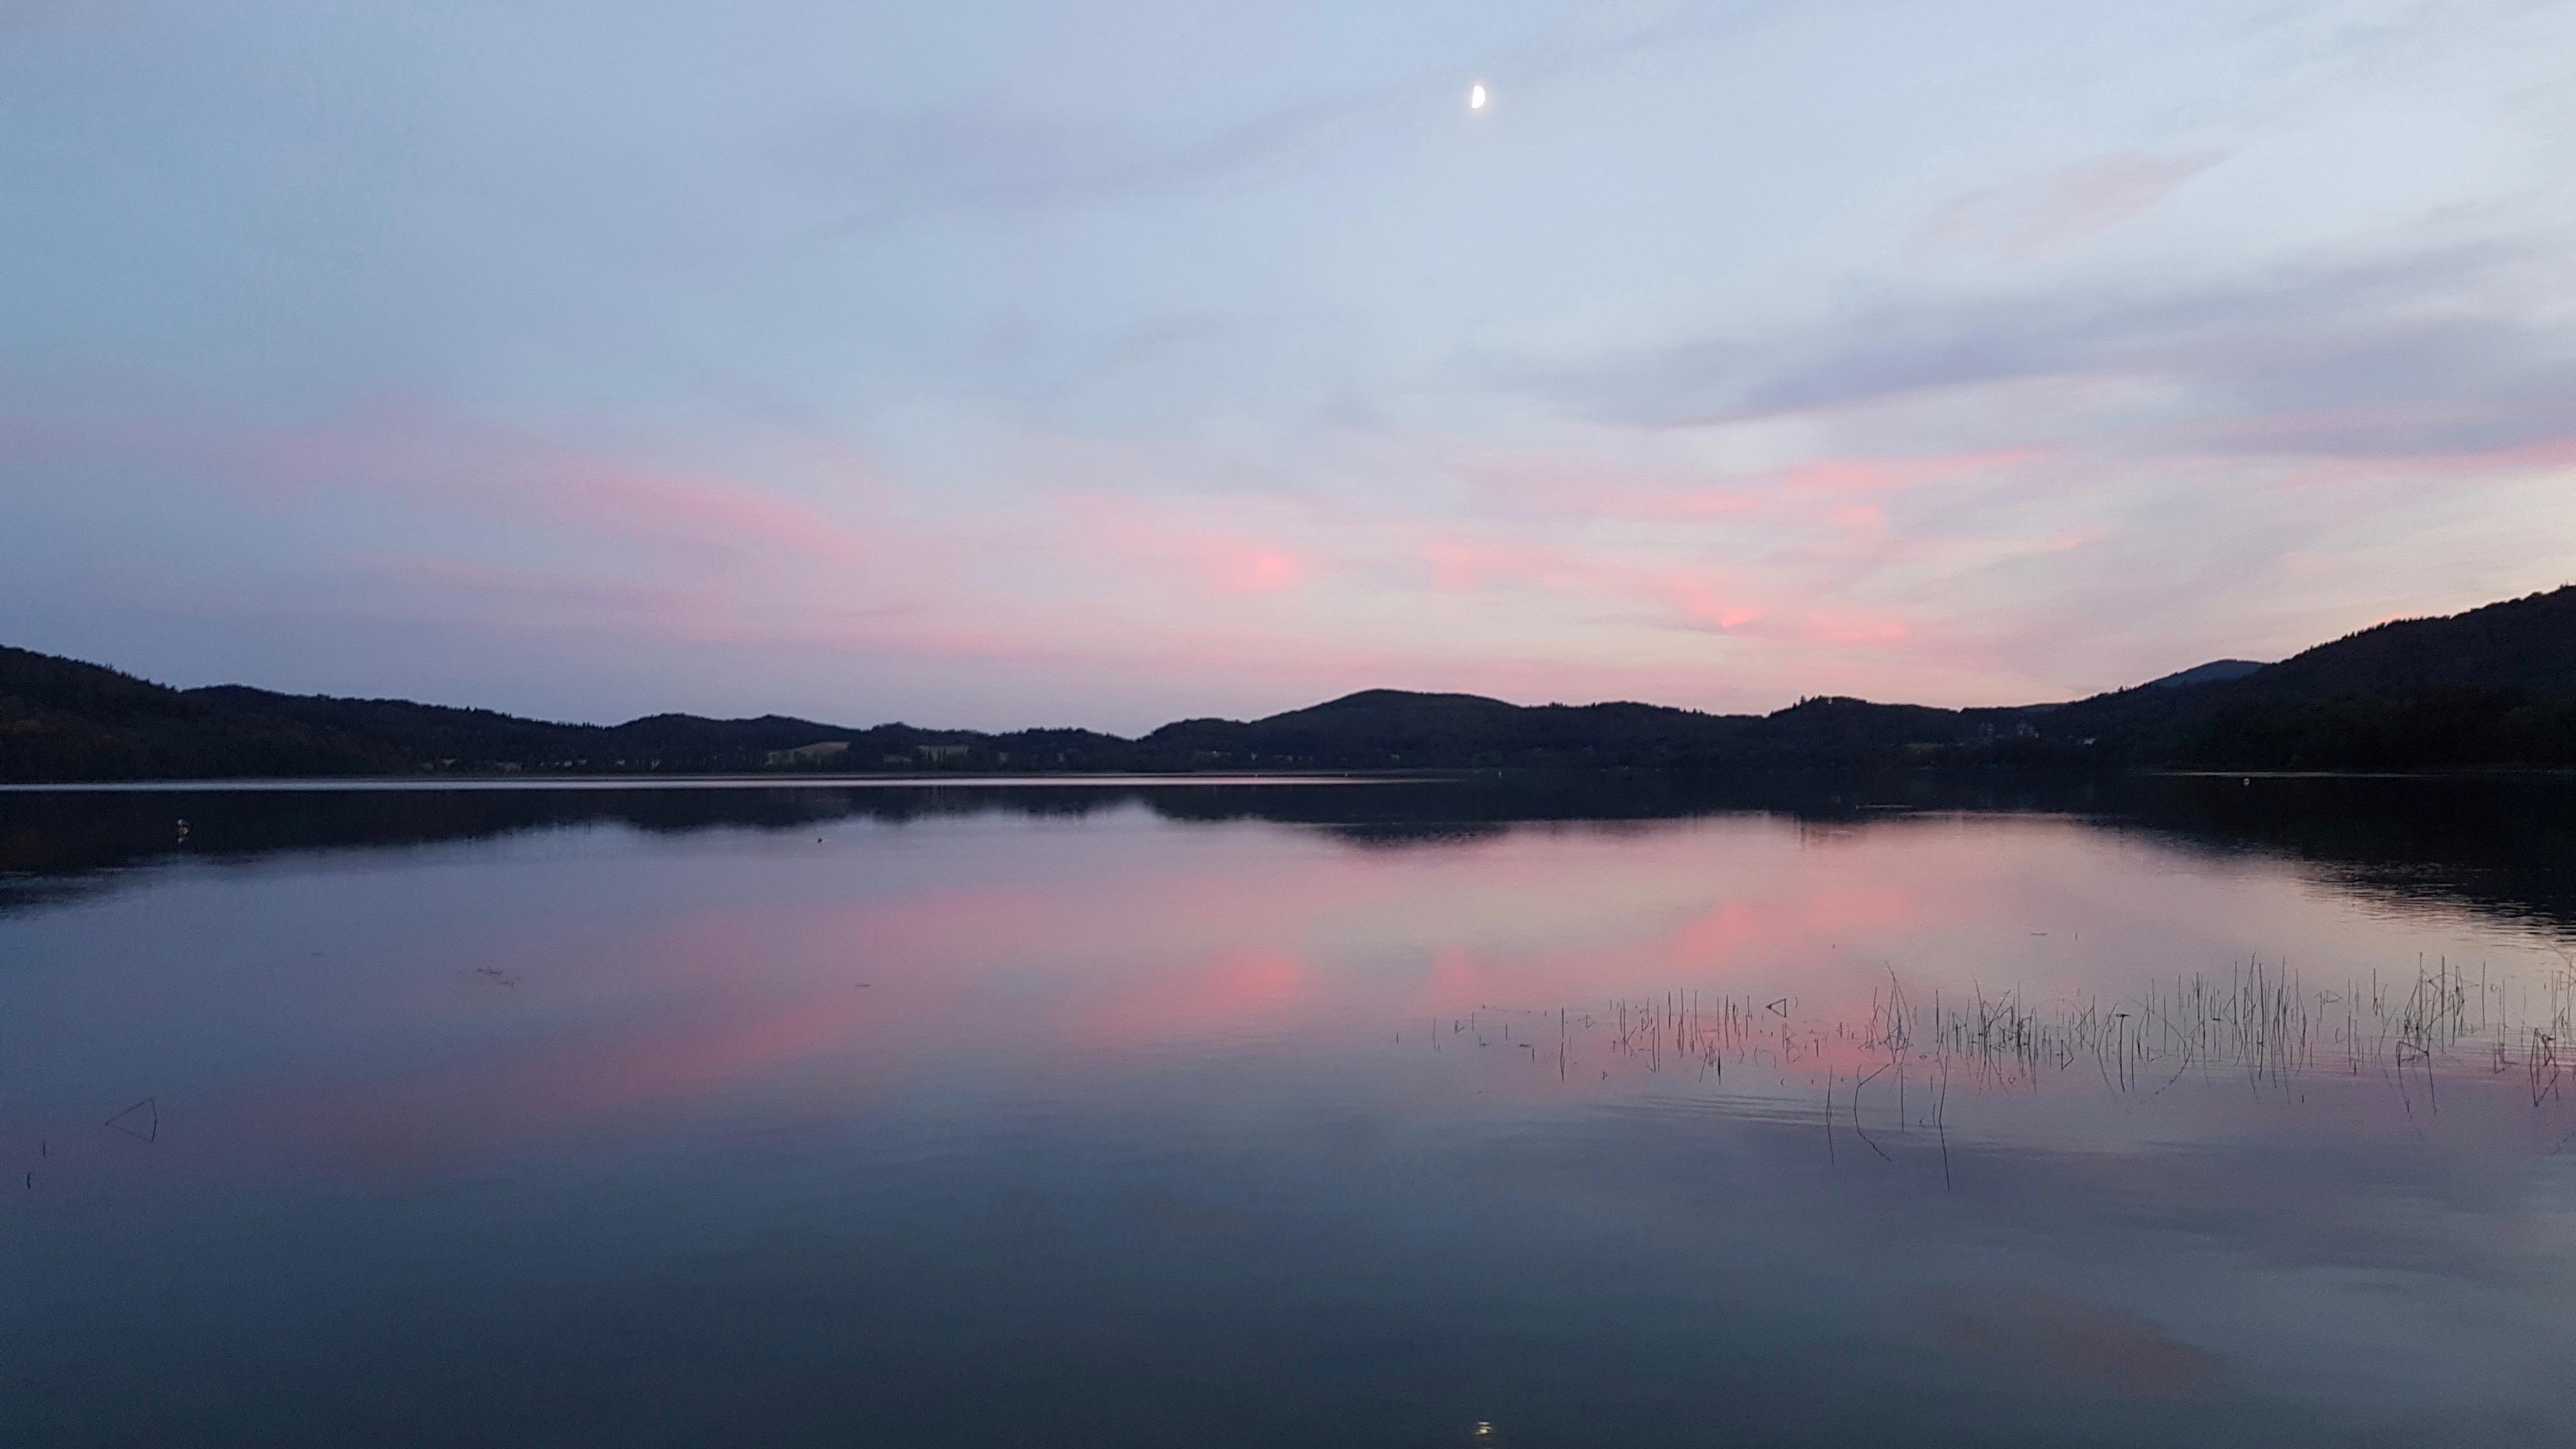 Sommer, Sonne, (Laacher) See – Kurzurlaub in der Vulkaneifel